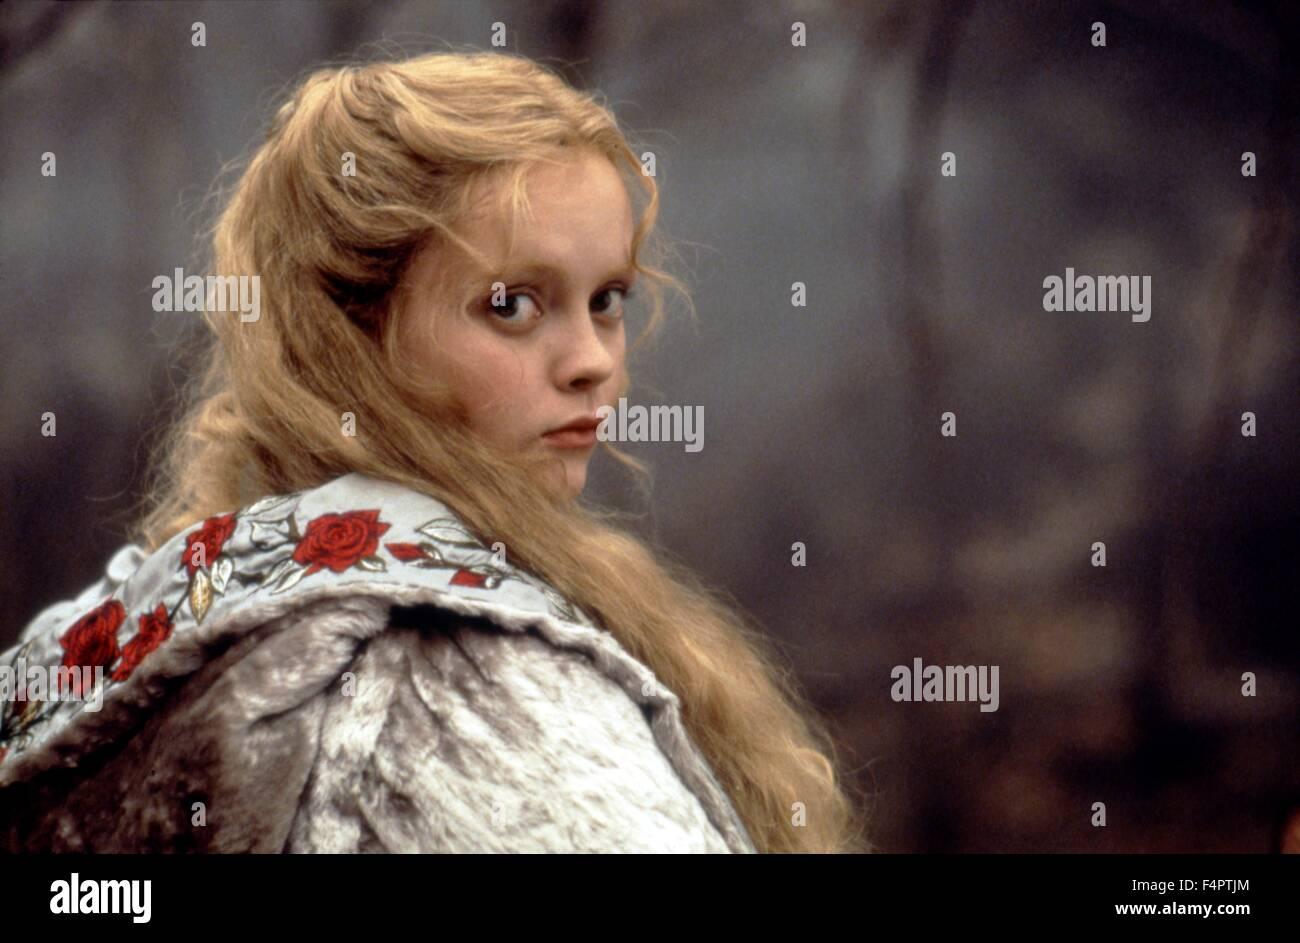 Christina Ricci Sleepy Hollow 1999 Directed By Tim Burton Stock Photo Alamy